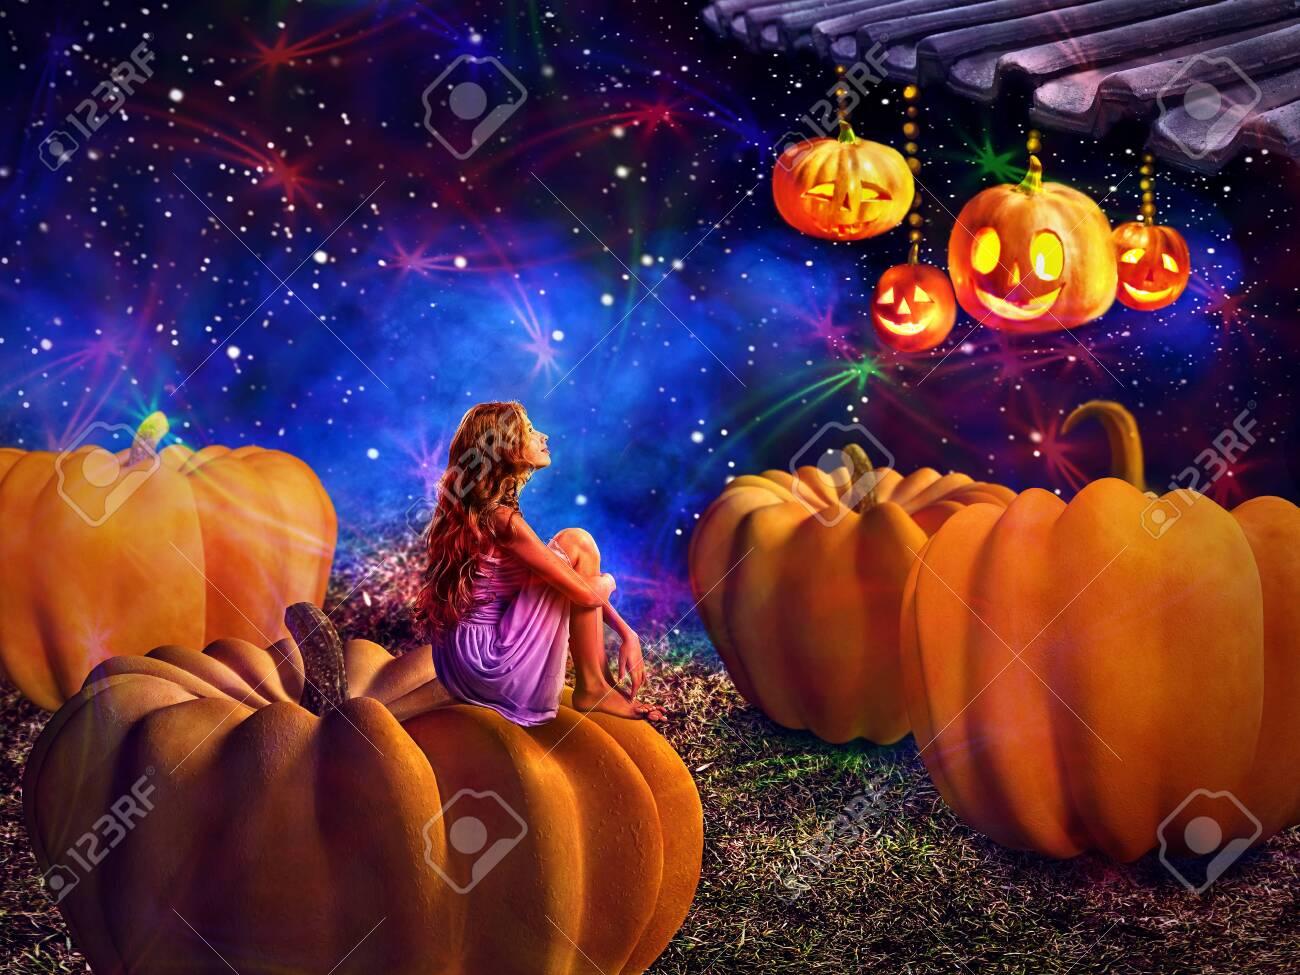 Kid on pumkin in halloween night dreems about fall harvest holiday. Magic jack lantern pumpkin decoration roof light by girl. Autumn children sitting on star sky background. - 155664704